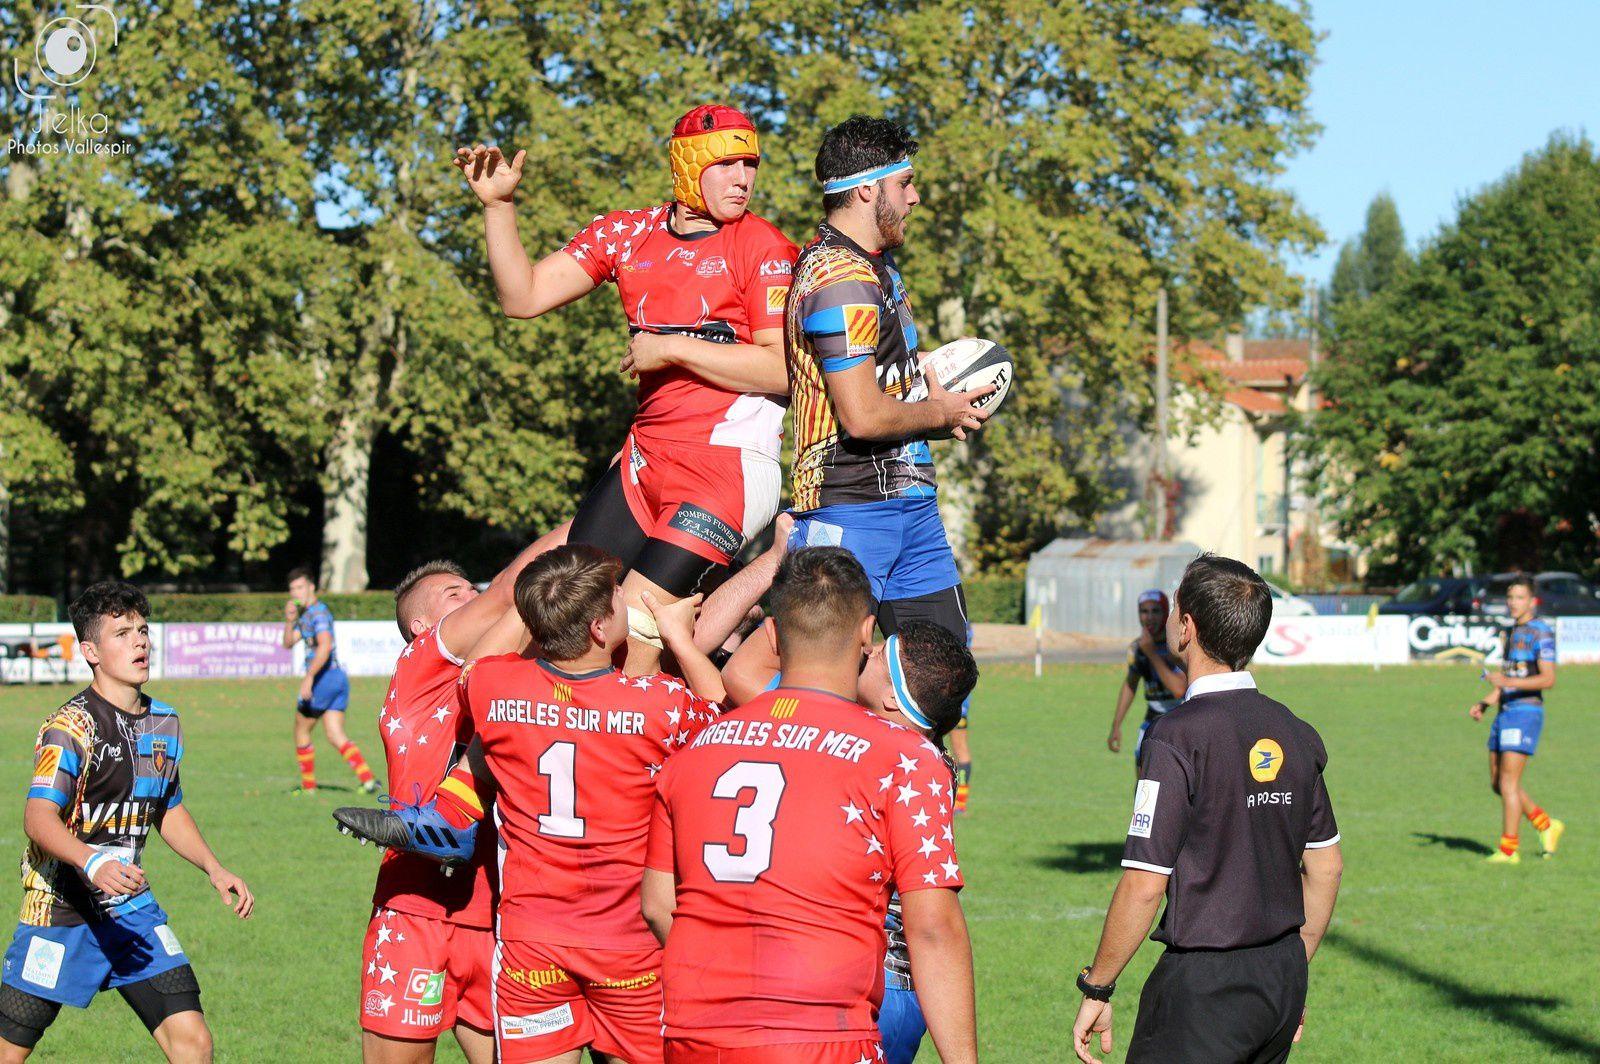 CÉRET - ARGELÈS (juniors Balandrade)